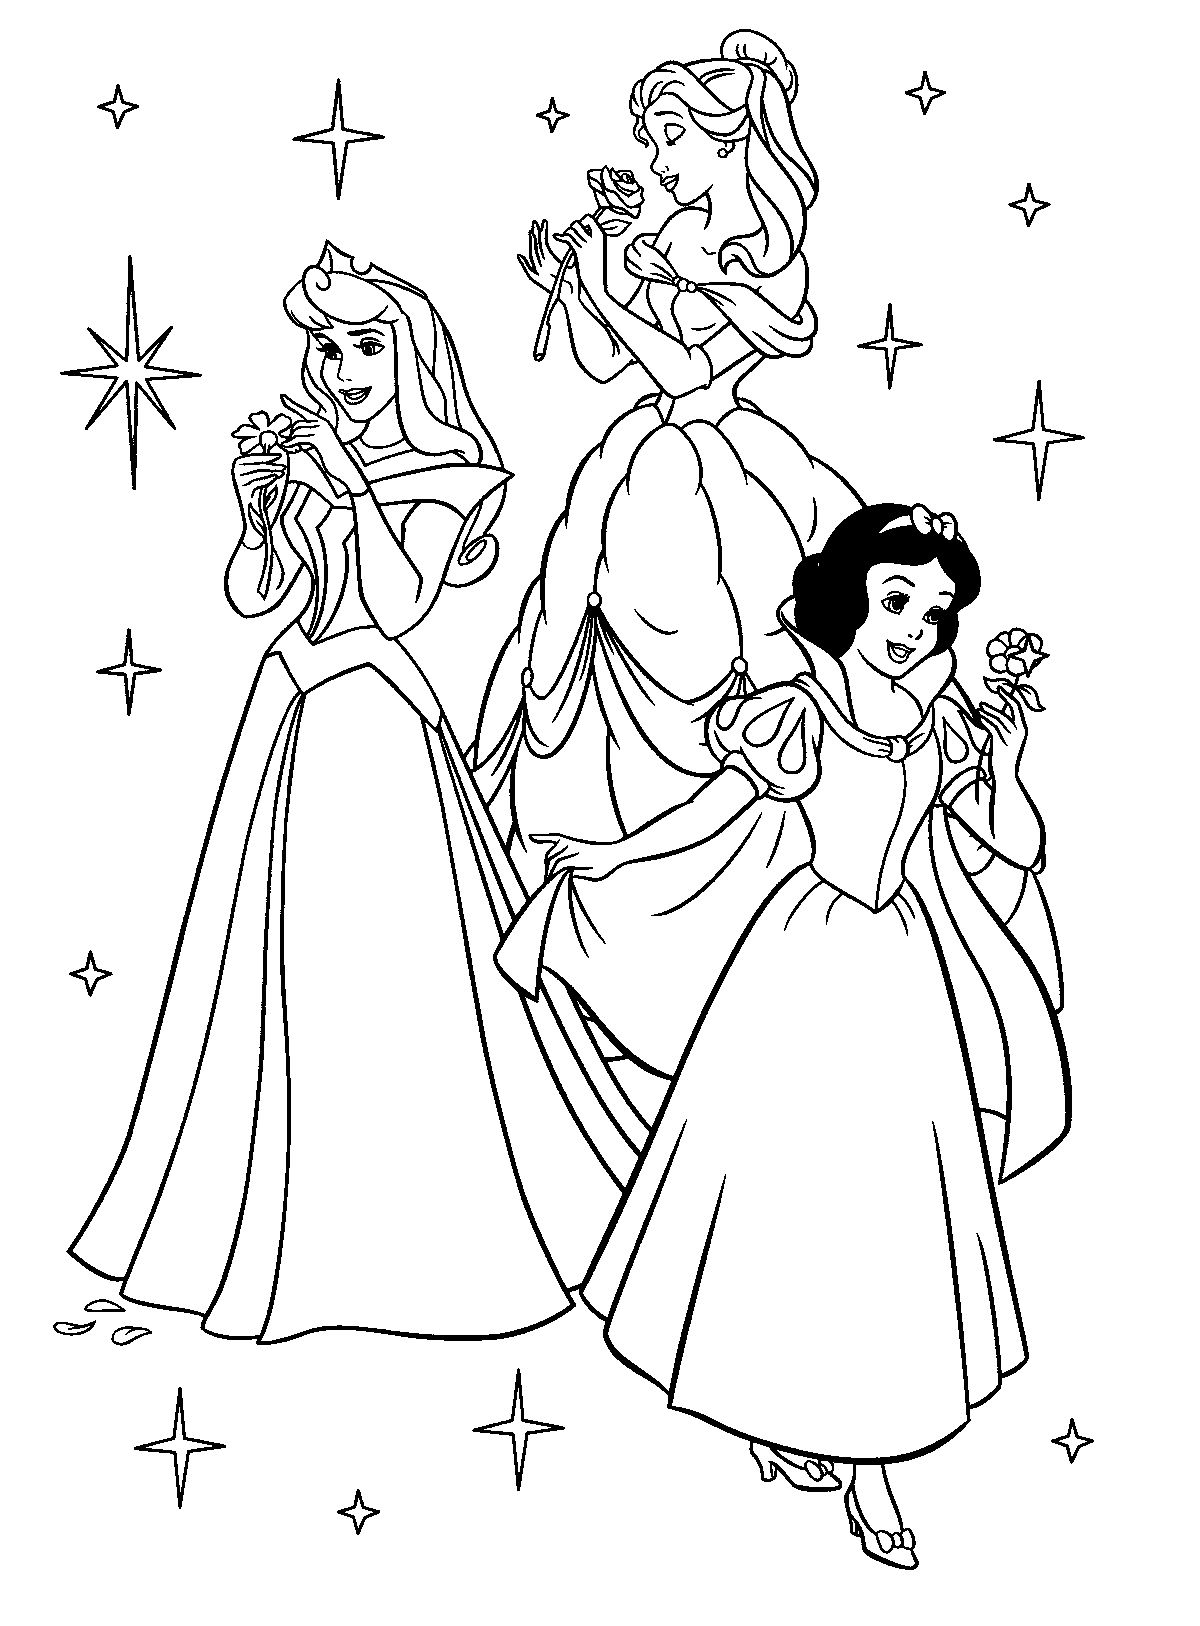 Disneyfrozencoloringpages Disney Princess Coloring Pages To Print